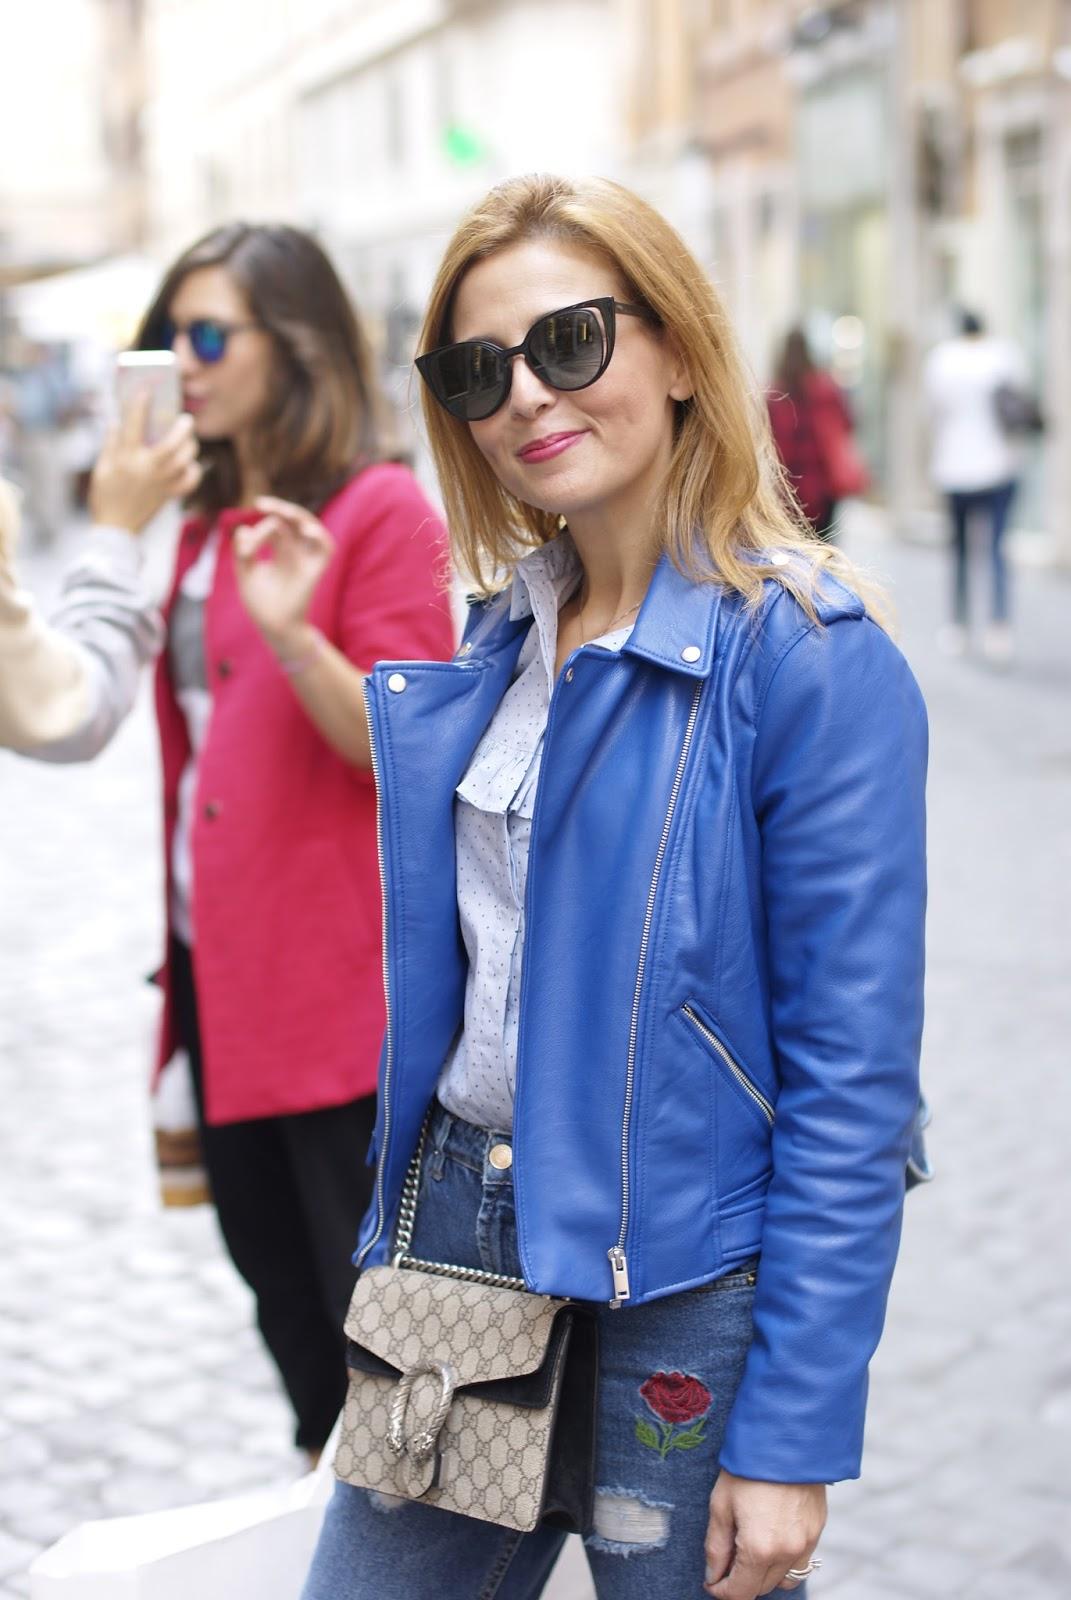 Gucci dionysus bag on Fashion and Cookies fashion blog, fashion blogger style